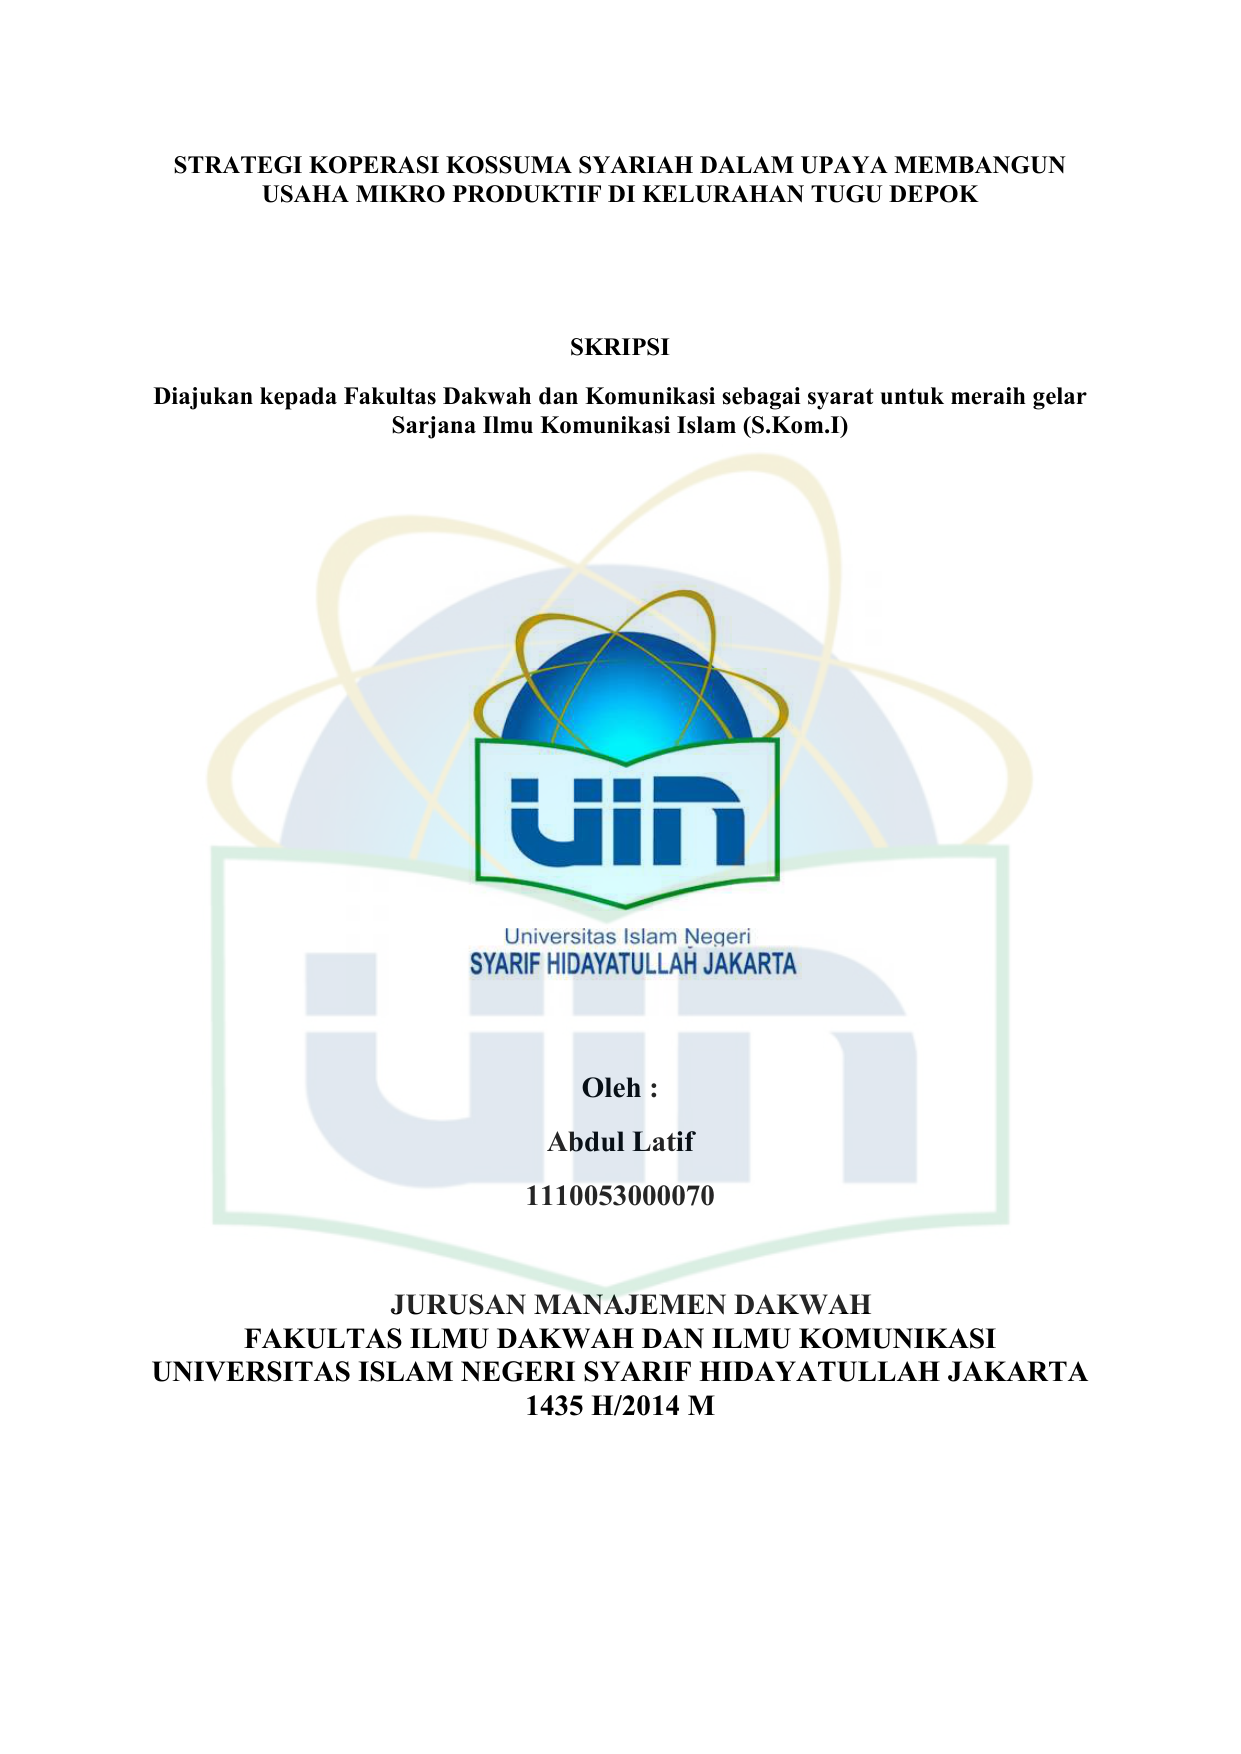 Abdul Latif Fdk Repository Uin Jakarta